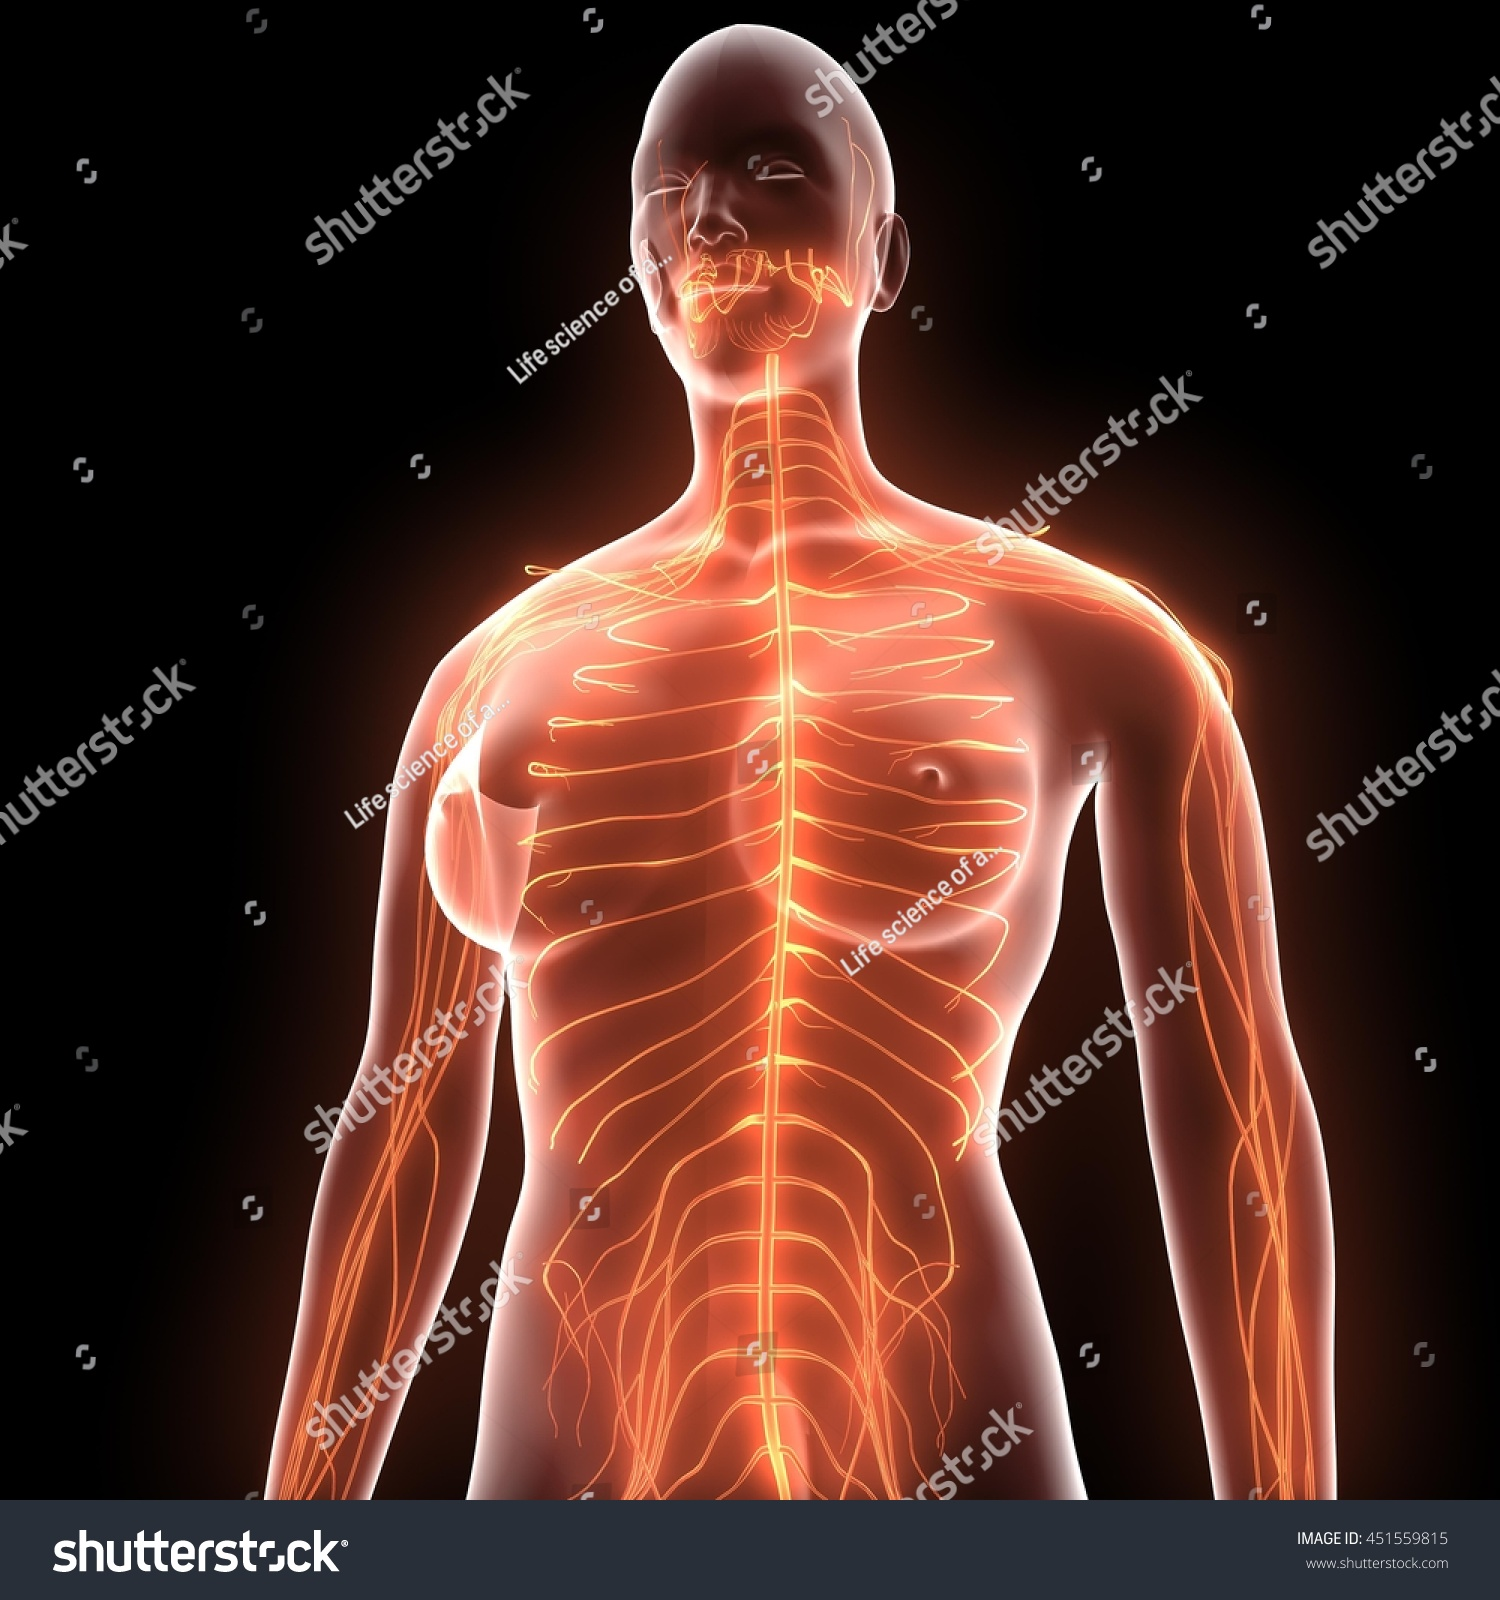 Royalty Free Stock Illustration Of Human Body Nerves Veins Arteries